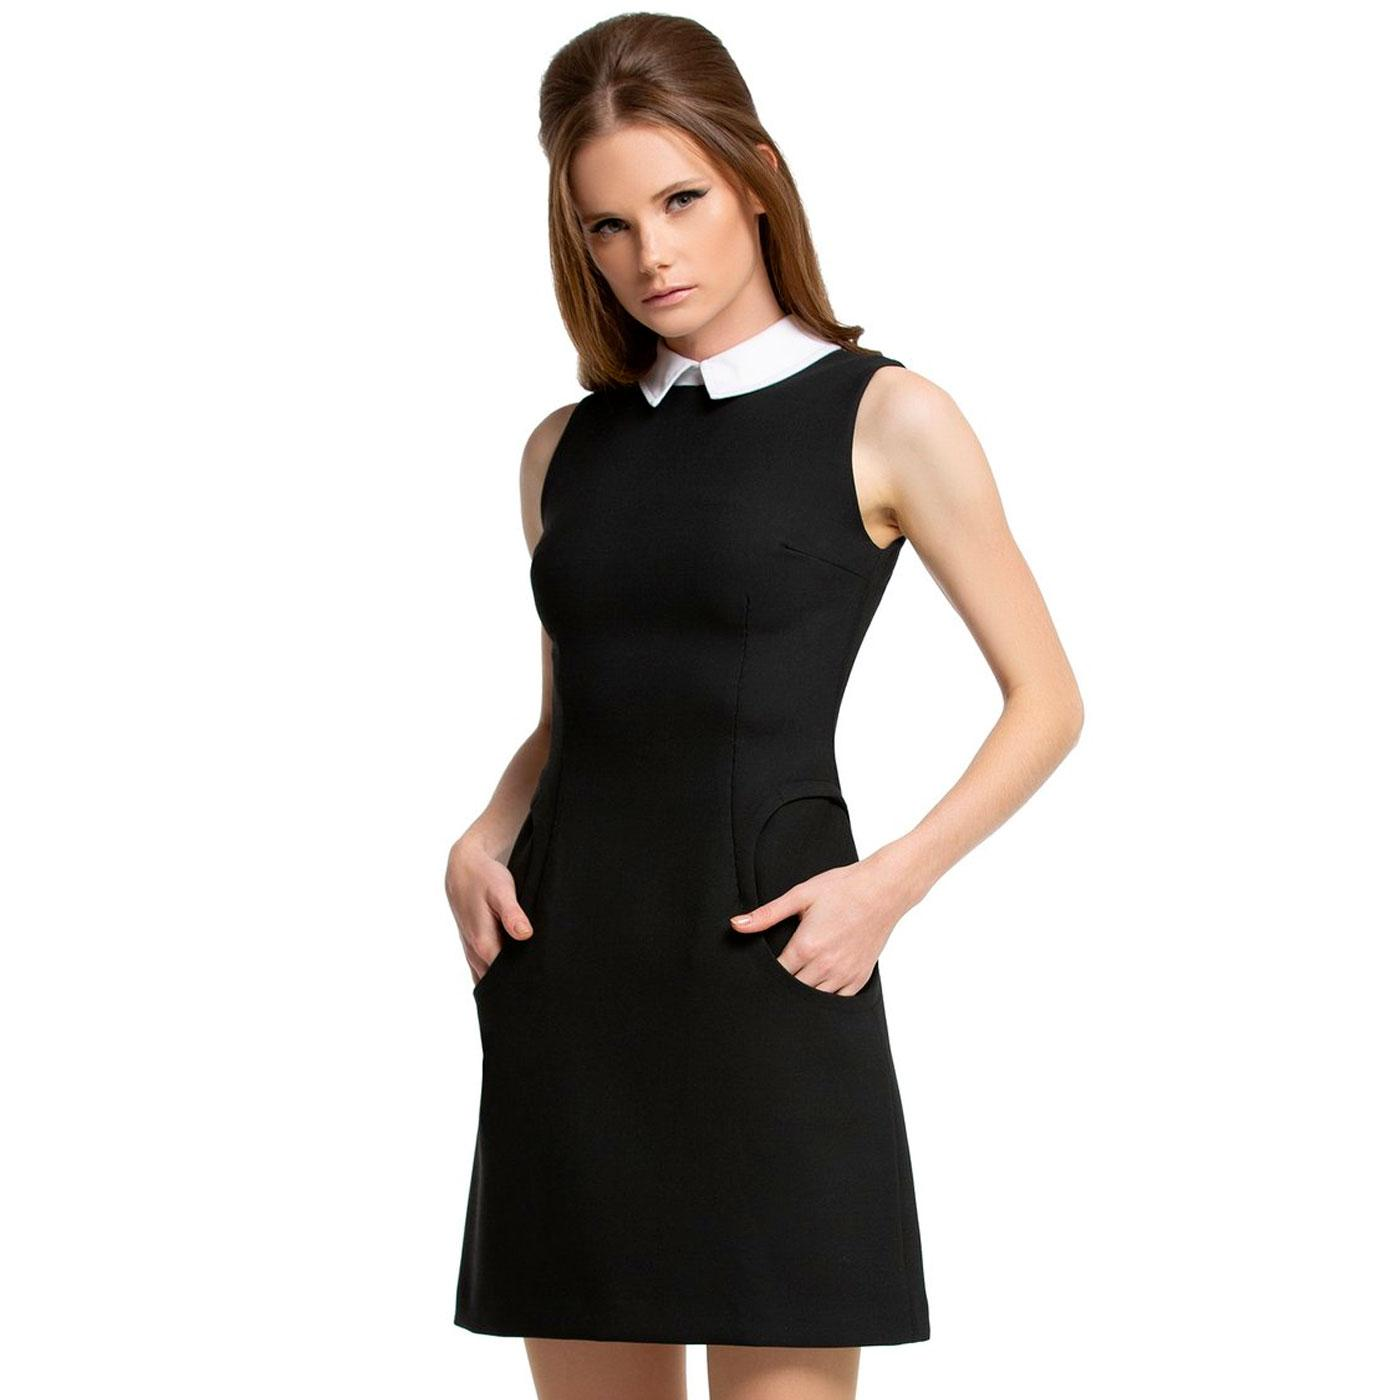 MARMALADE Mod Collared Circle Pocket Dress (Black)